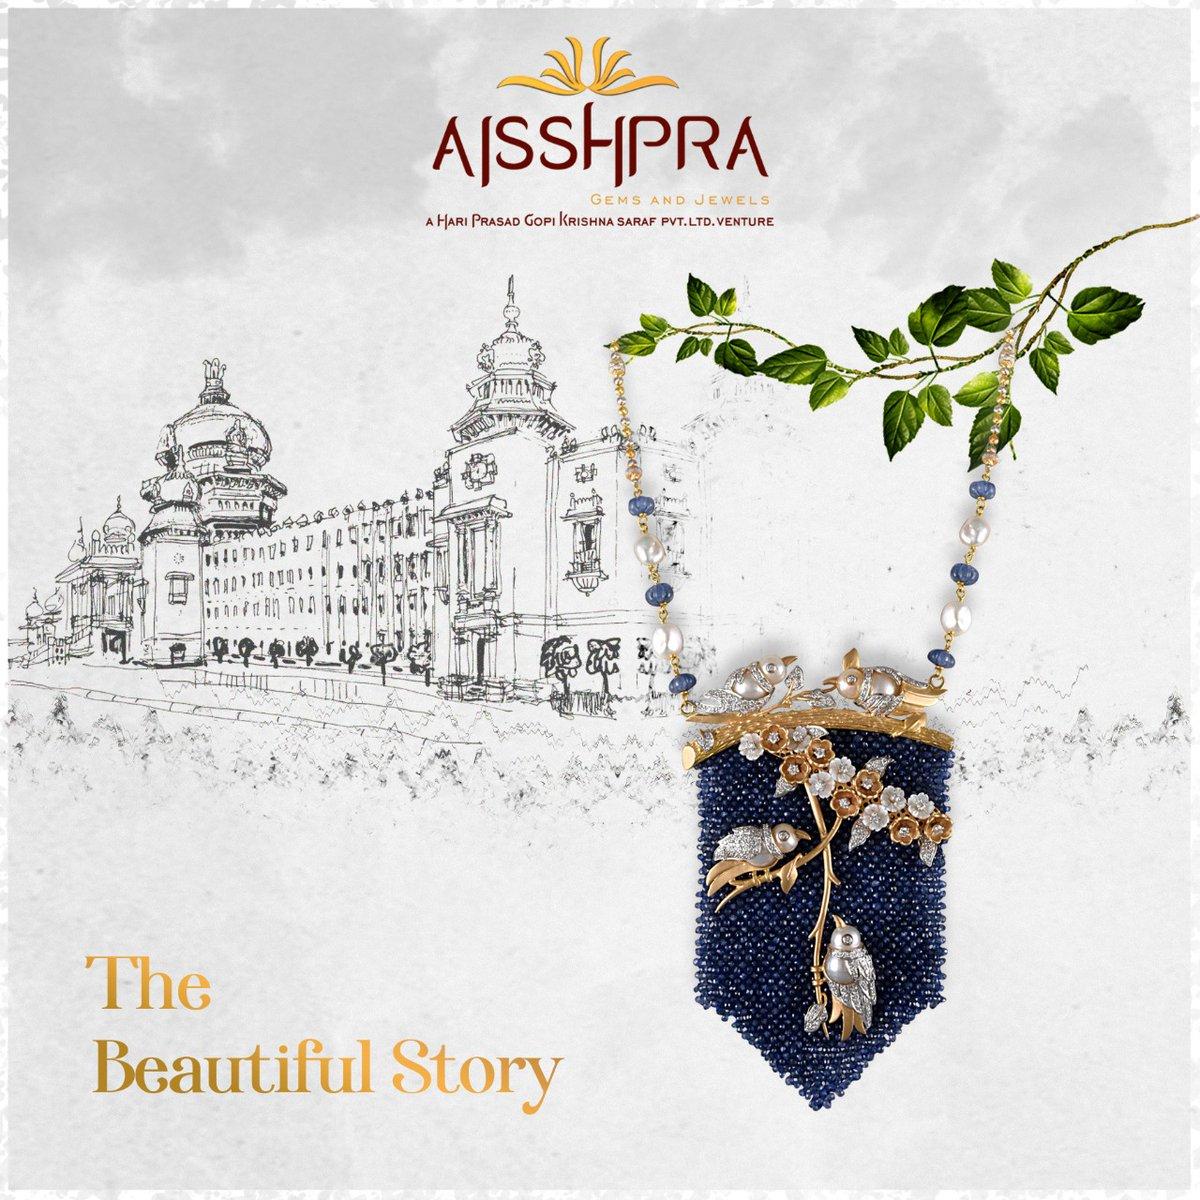 Royal style always has a beautiful story. Let your style be impressive  #Aisshpra #jewellerystore #masterpiece #jewellerylove #designerjewellery #designs #gorakhpur #jewellery #basti #padrauna #deoria #azamgarh #lucknowpic.twitter.com/Ee8bE5gAtW